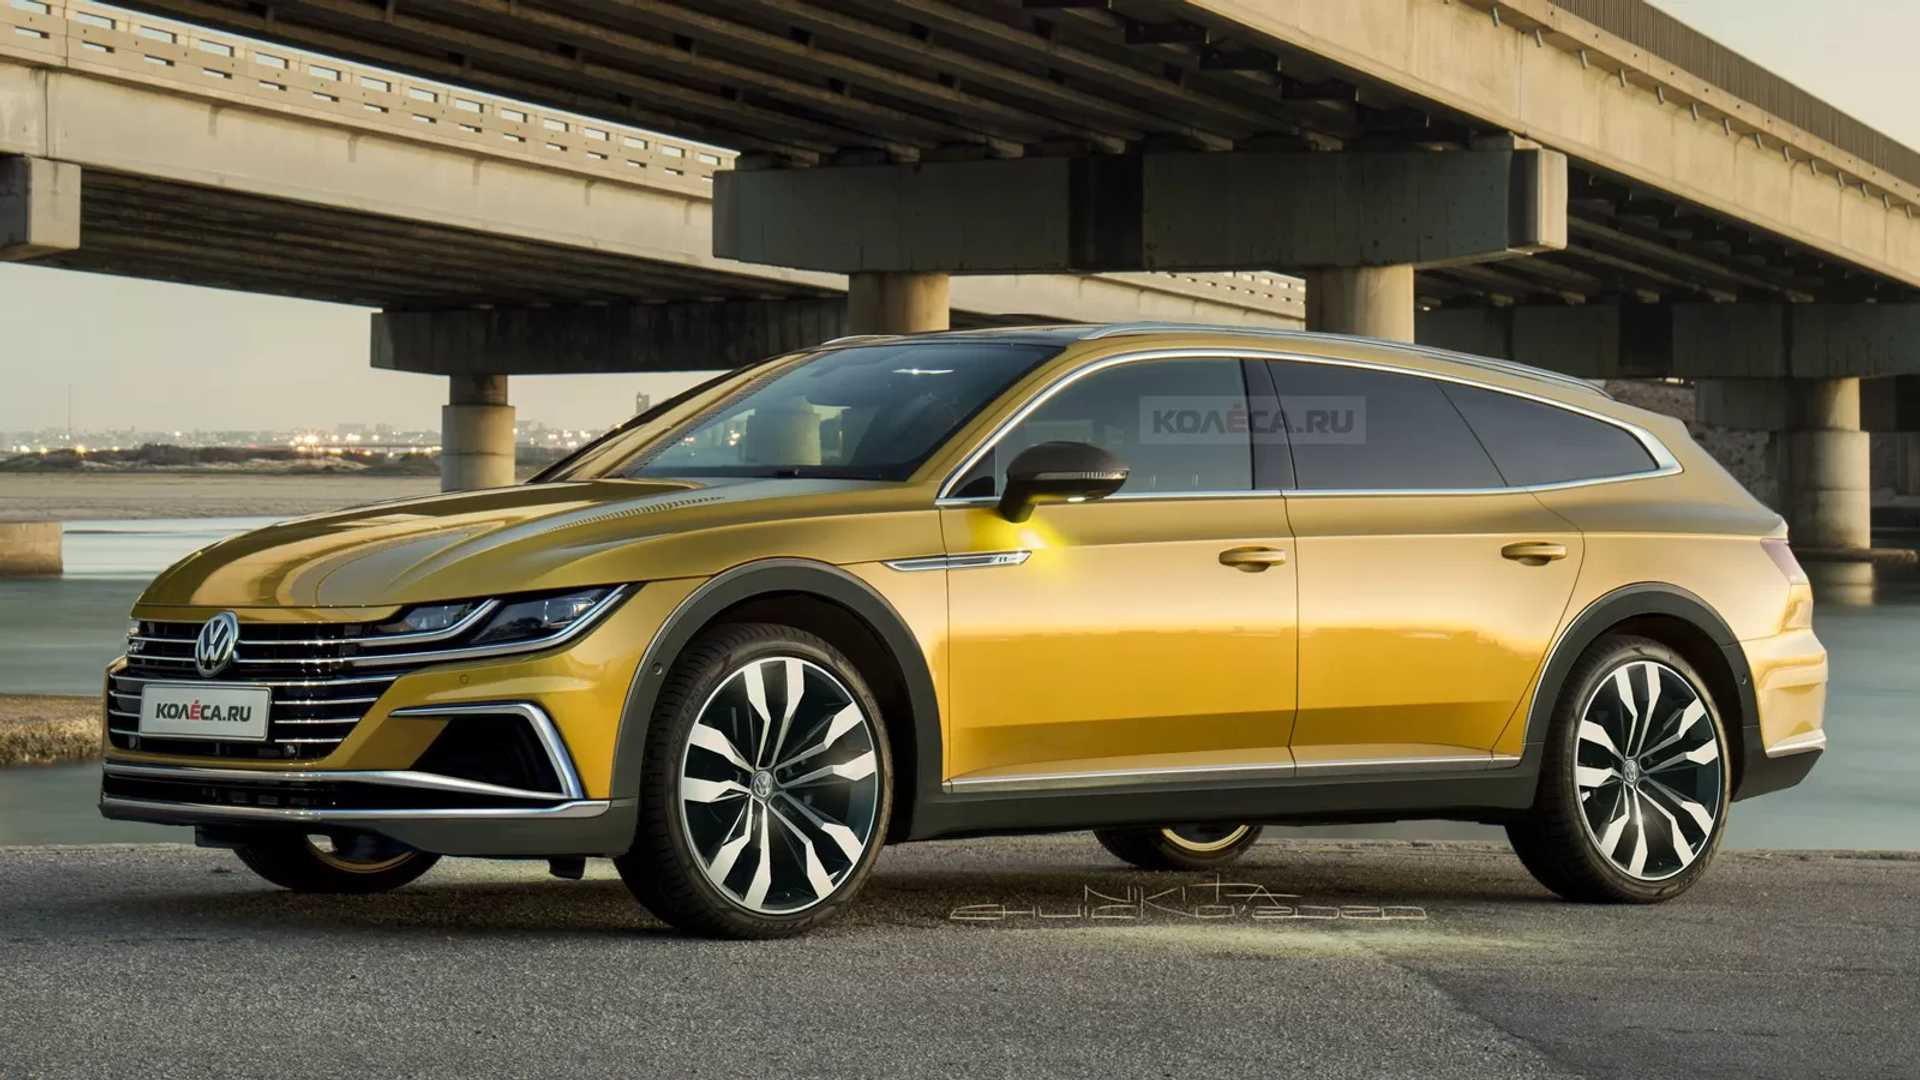 VW Arteon estate rendered as the anti-SUV